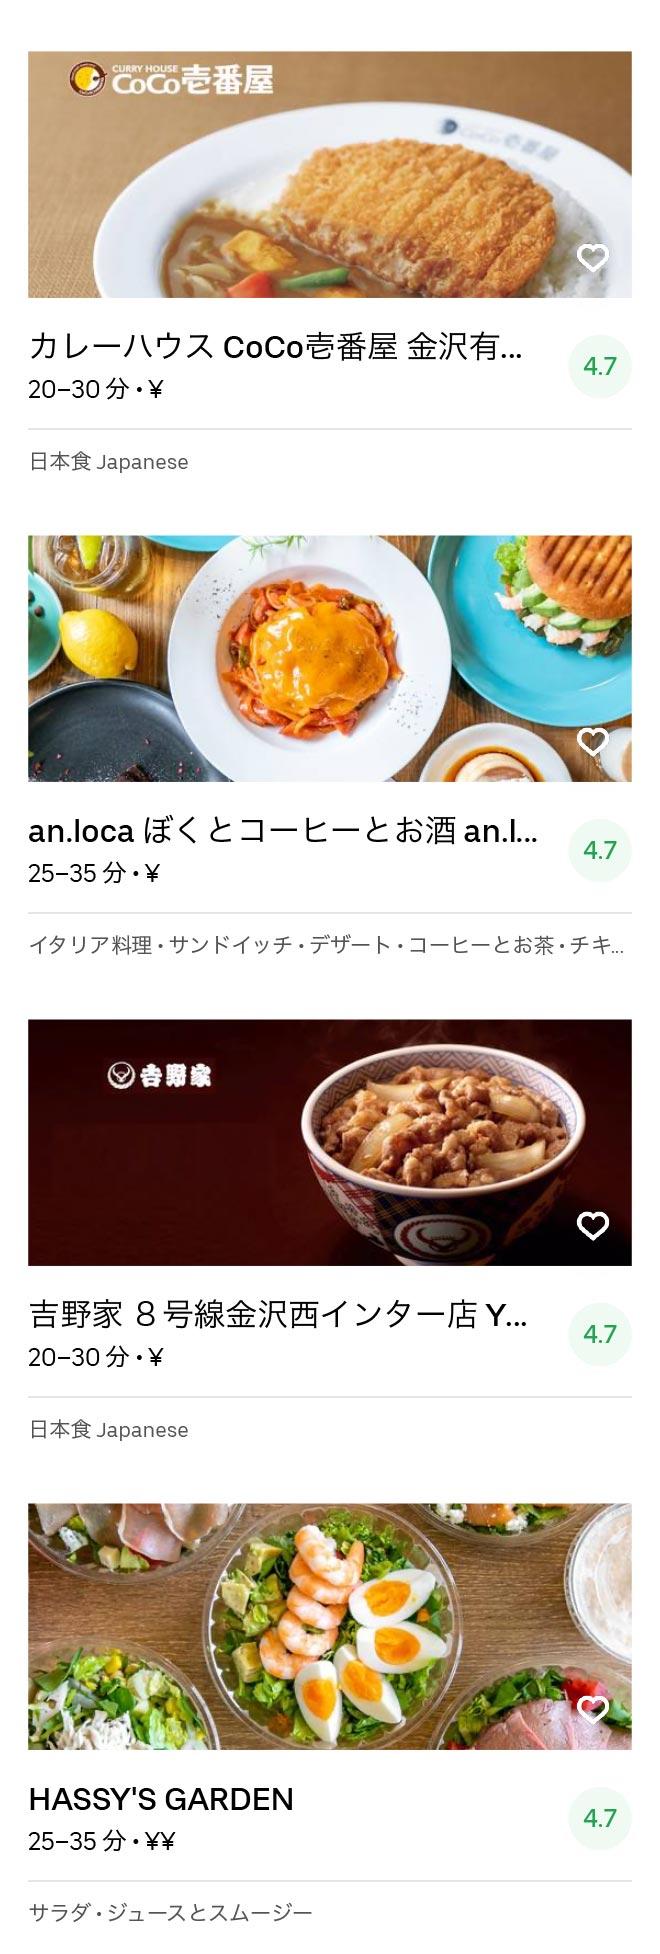 Nishi kanazawa menu 2005 03